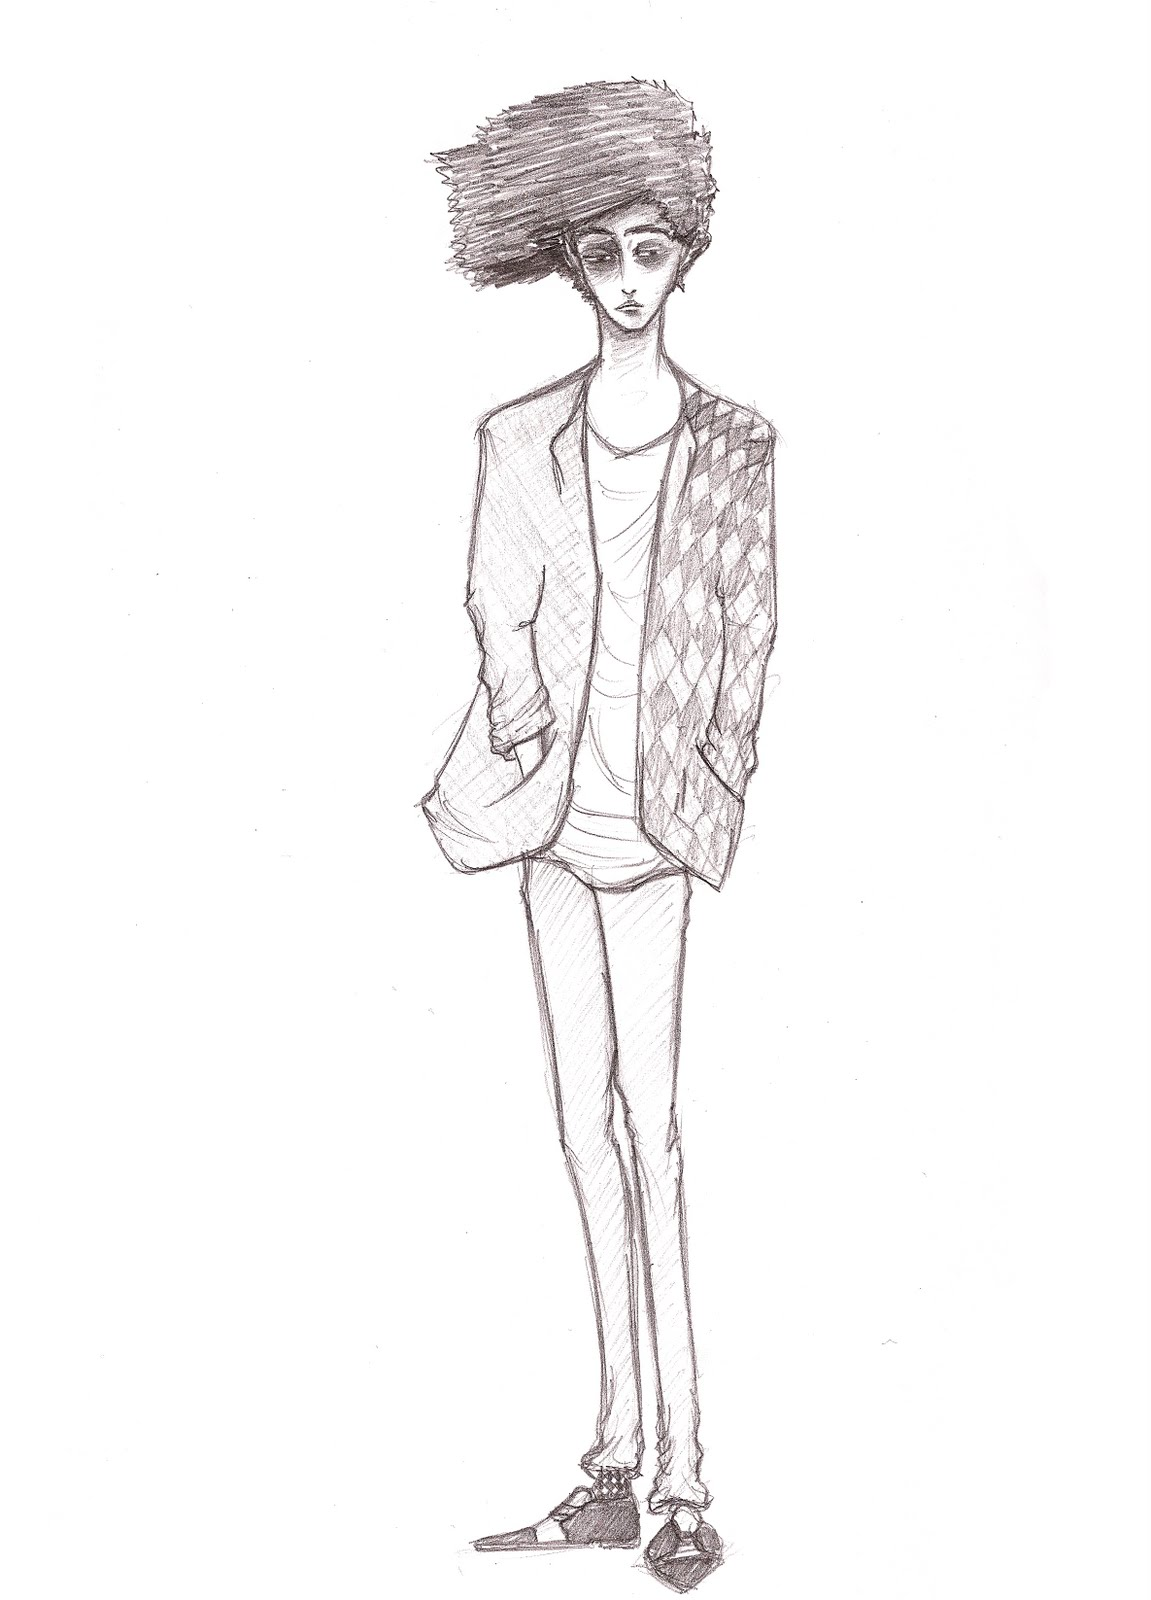 The Art of Danny Jackson: Pencil Drawings